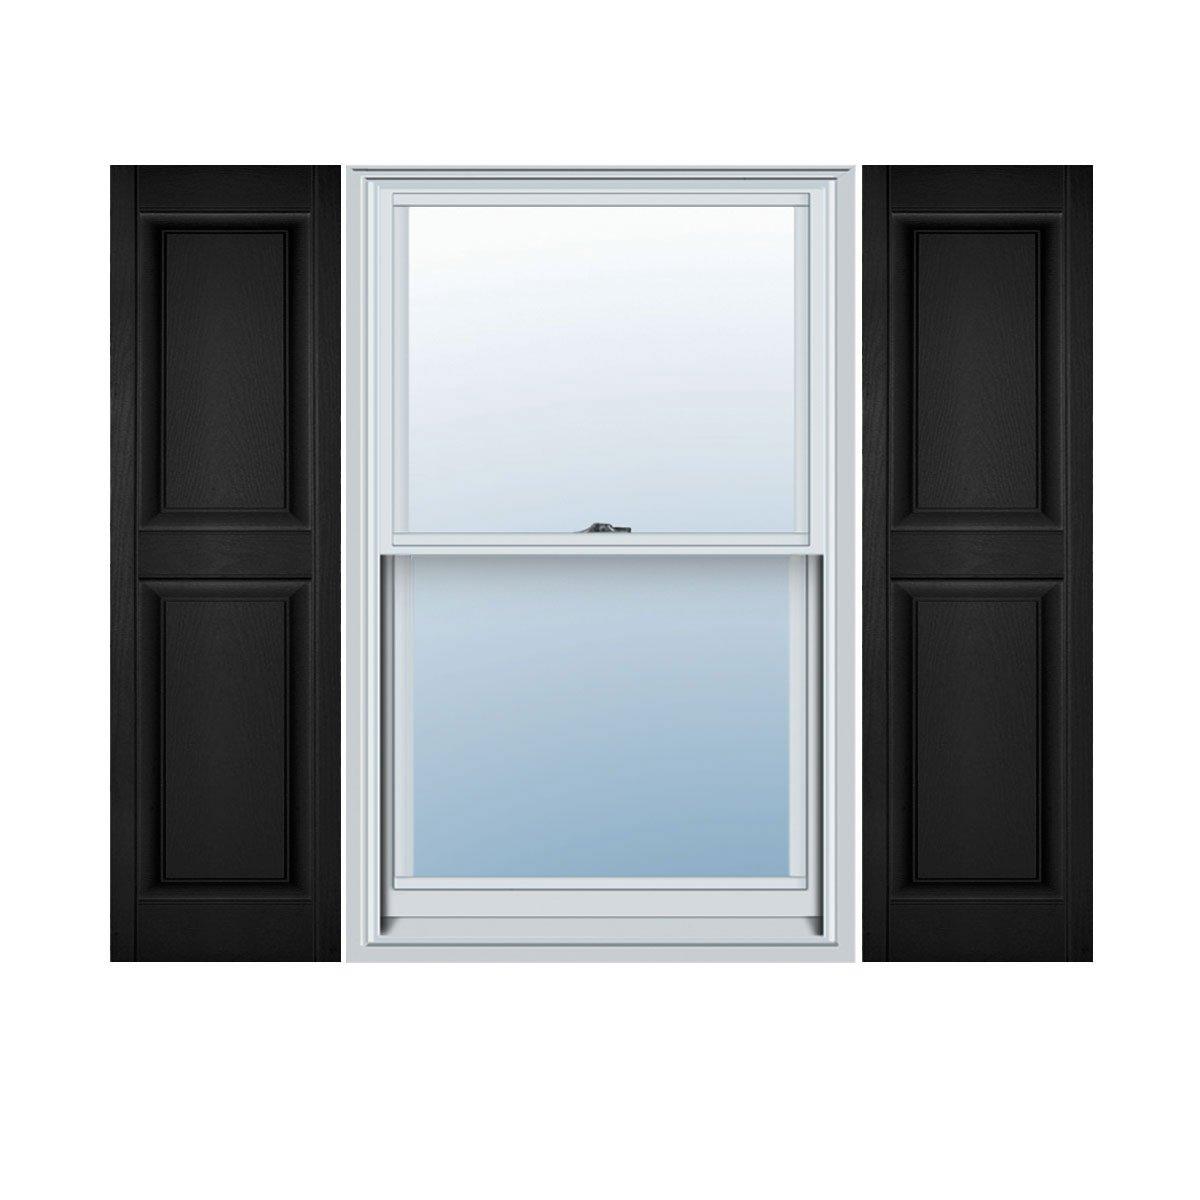 Ekena Millwork LP2C18X06000BL Custom Two Equal Panels, Raised PanelShutter (Per Pair)18''W x 60''HBlack by Ekena Millwork